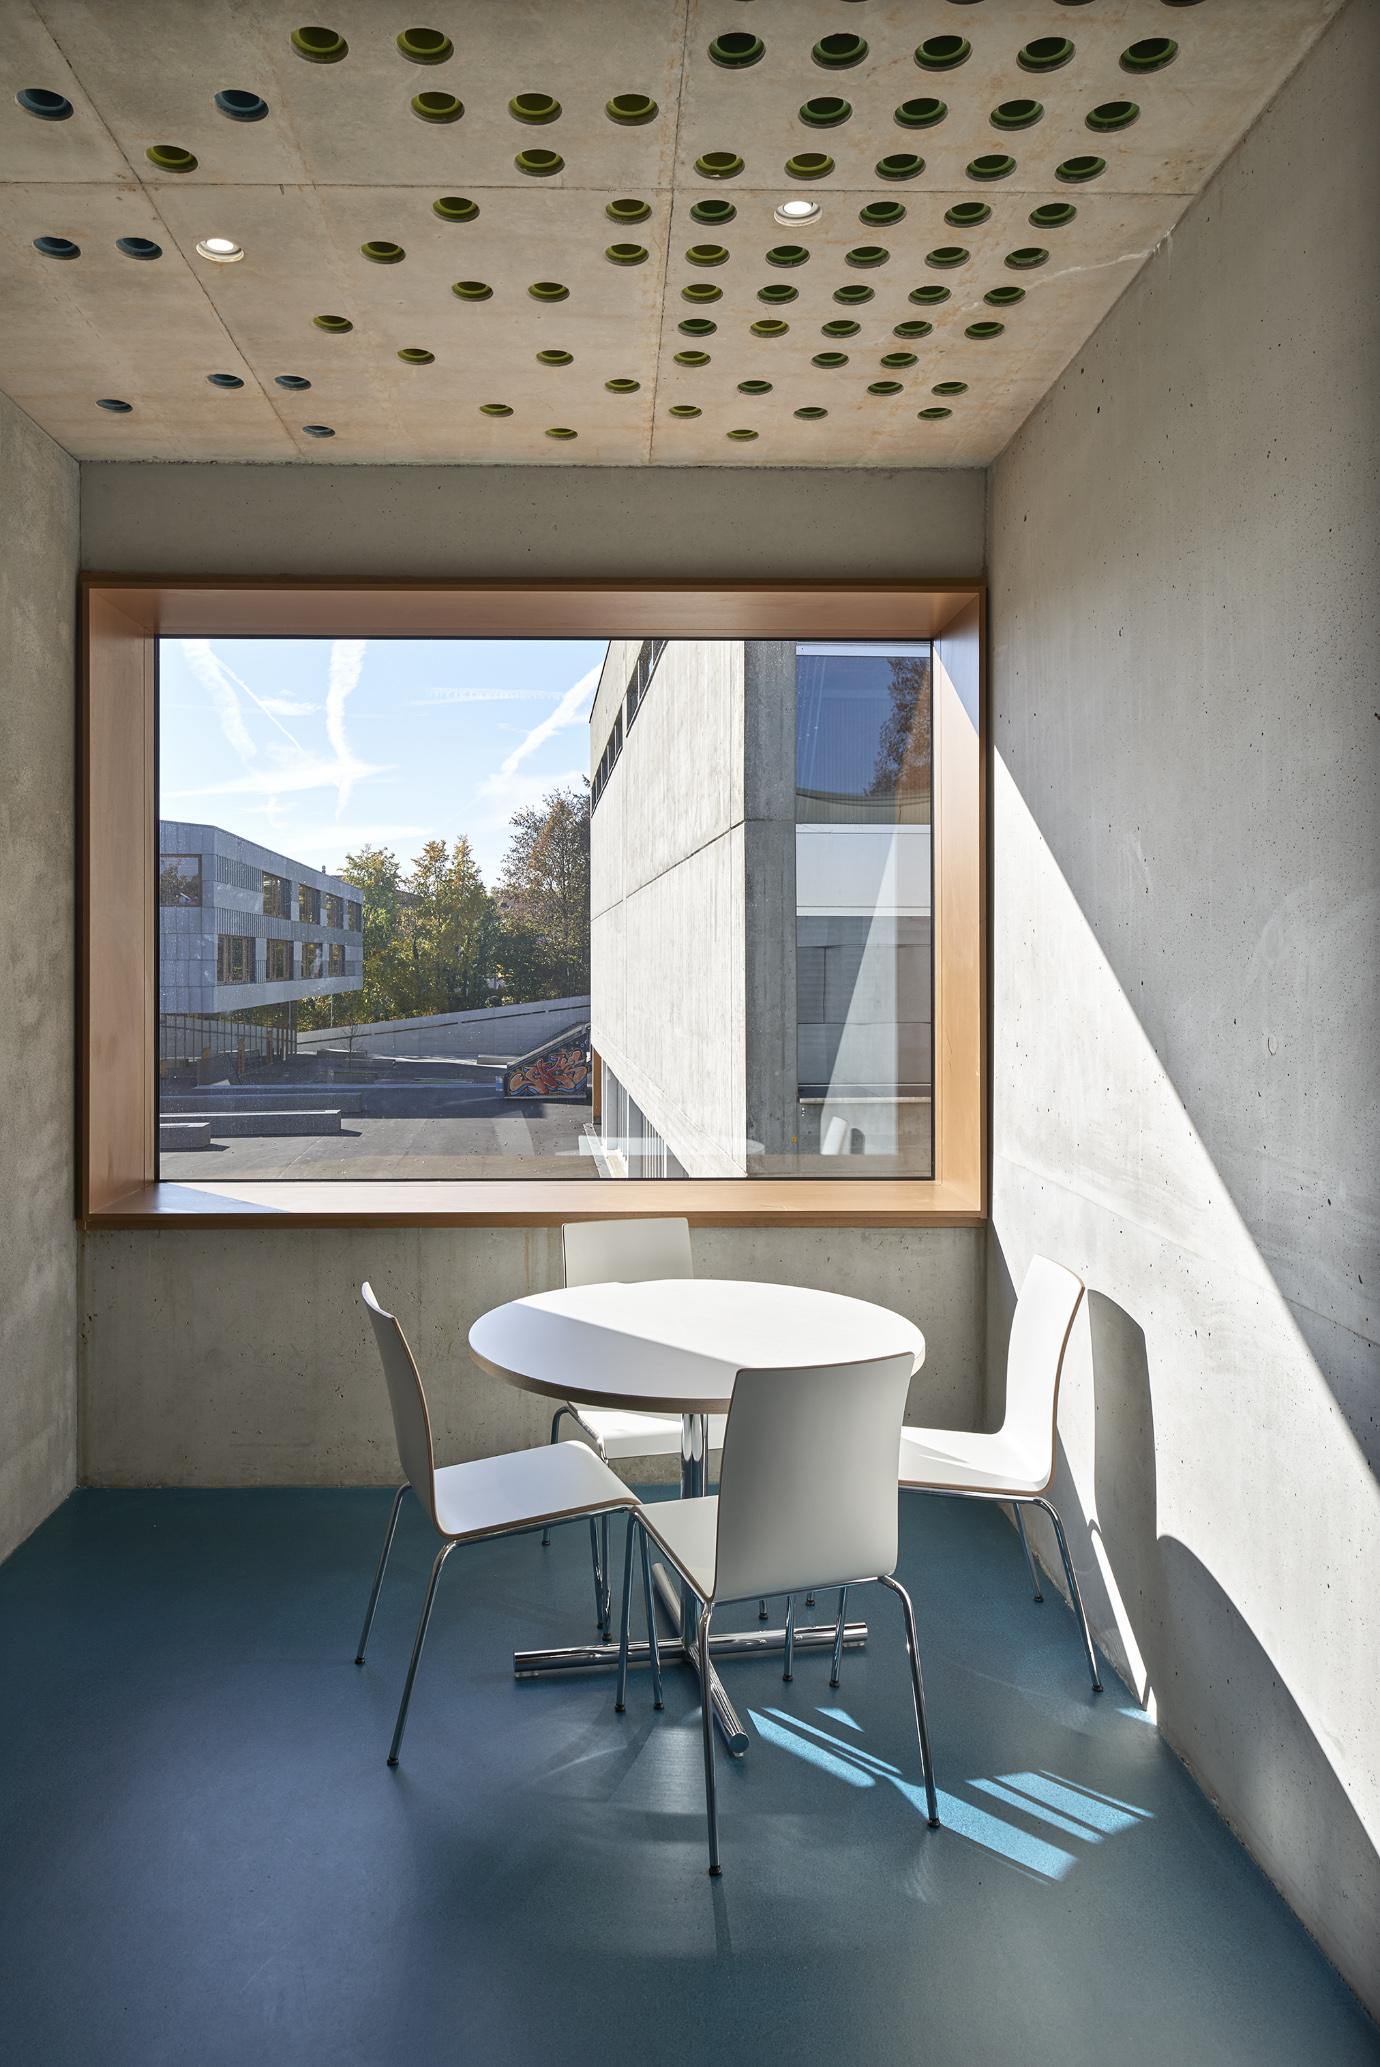 dettling péléraux architectes_013.jpg